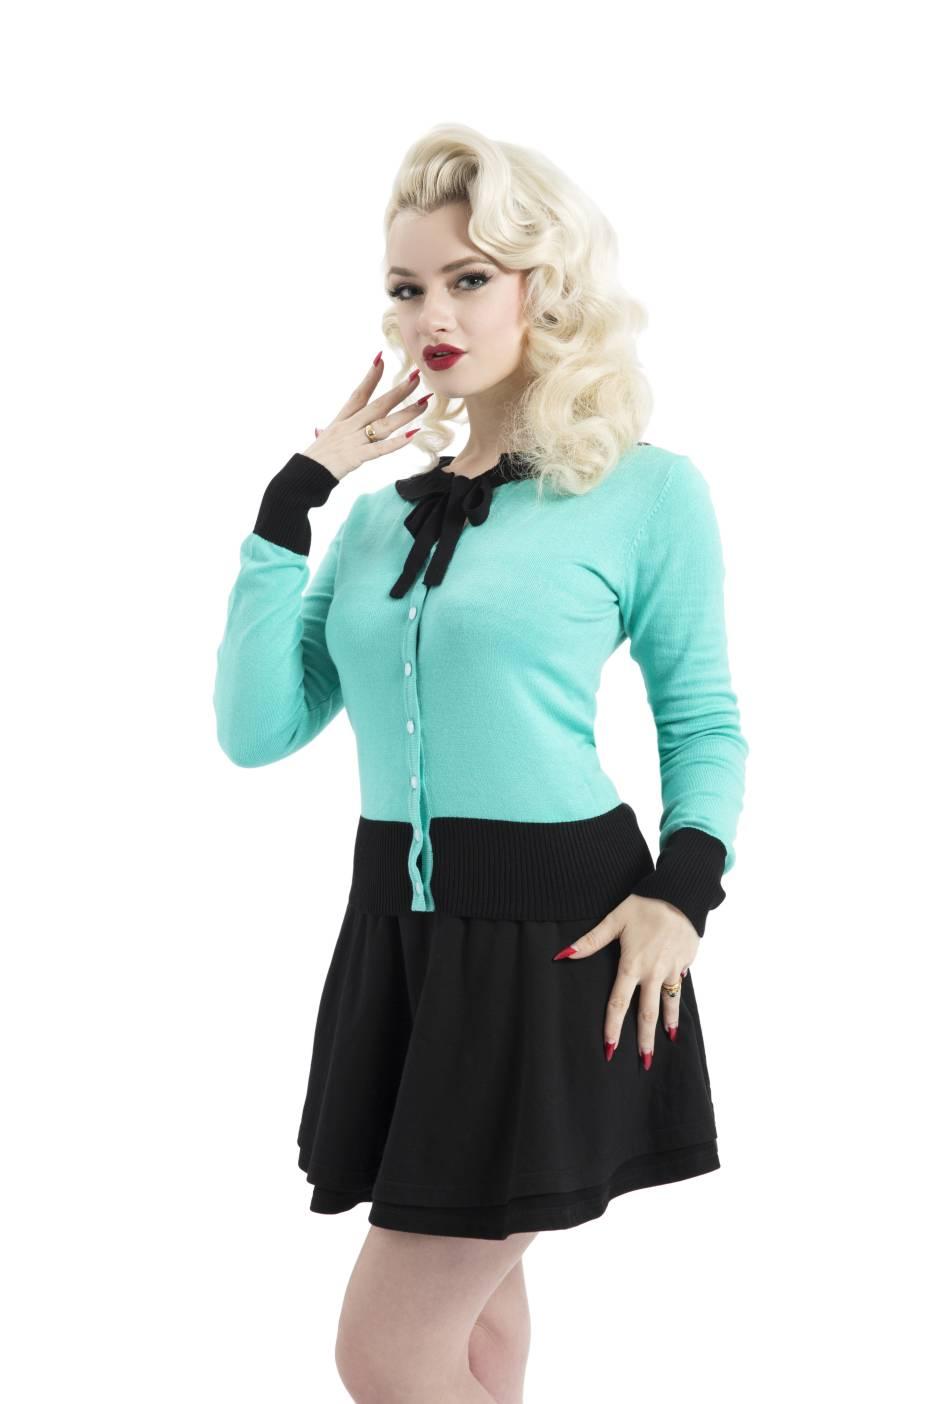 voodoo_vixen_octavia_sea_green_octo_girl_tattoo_cardigan_cardigans_and_sweaters_3.jpg